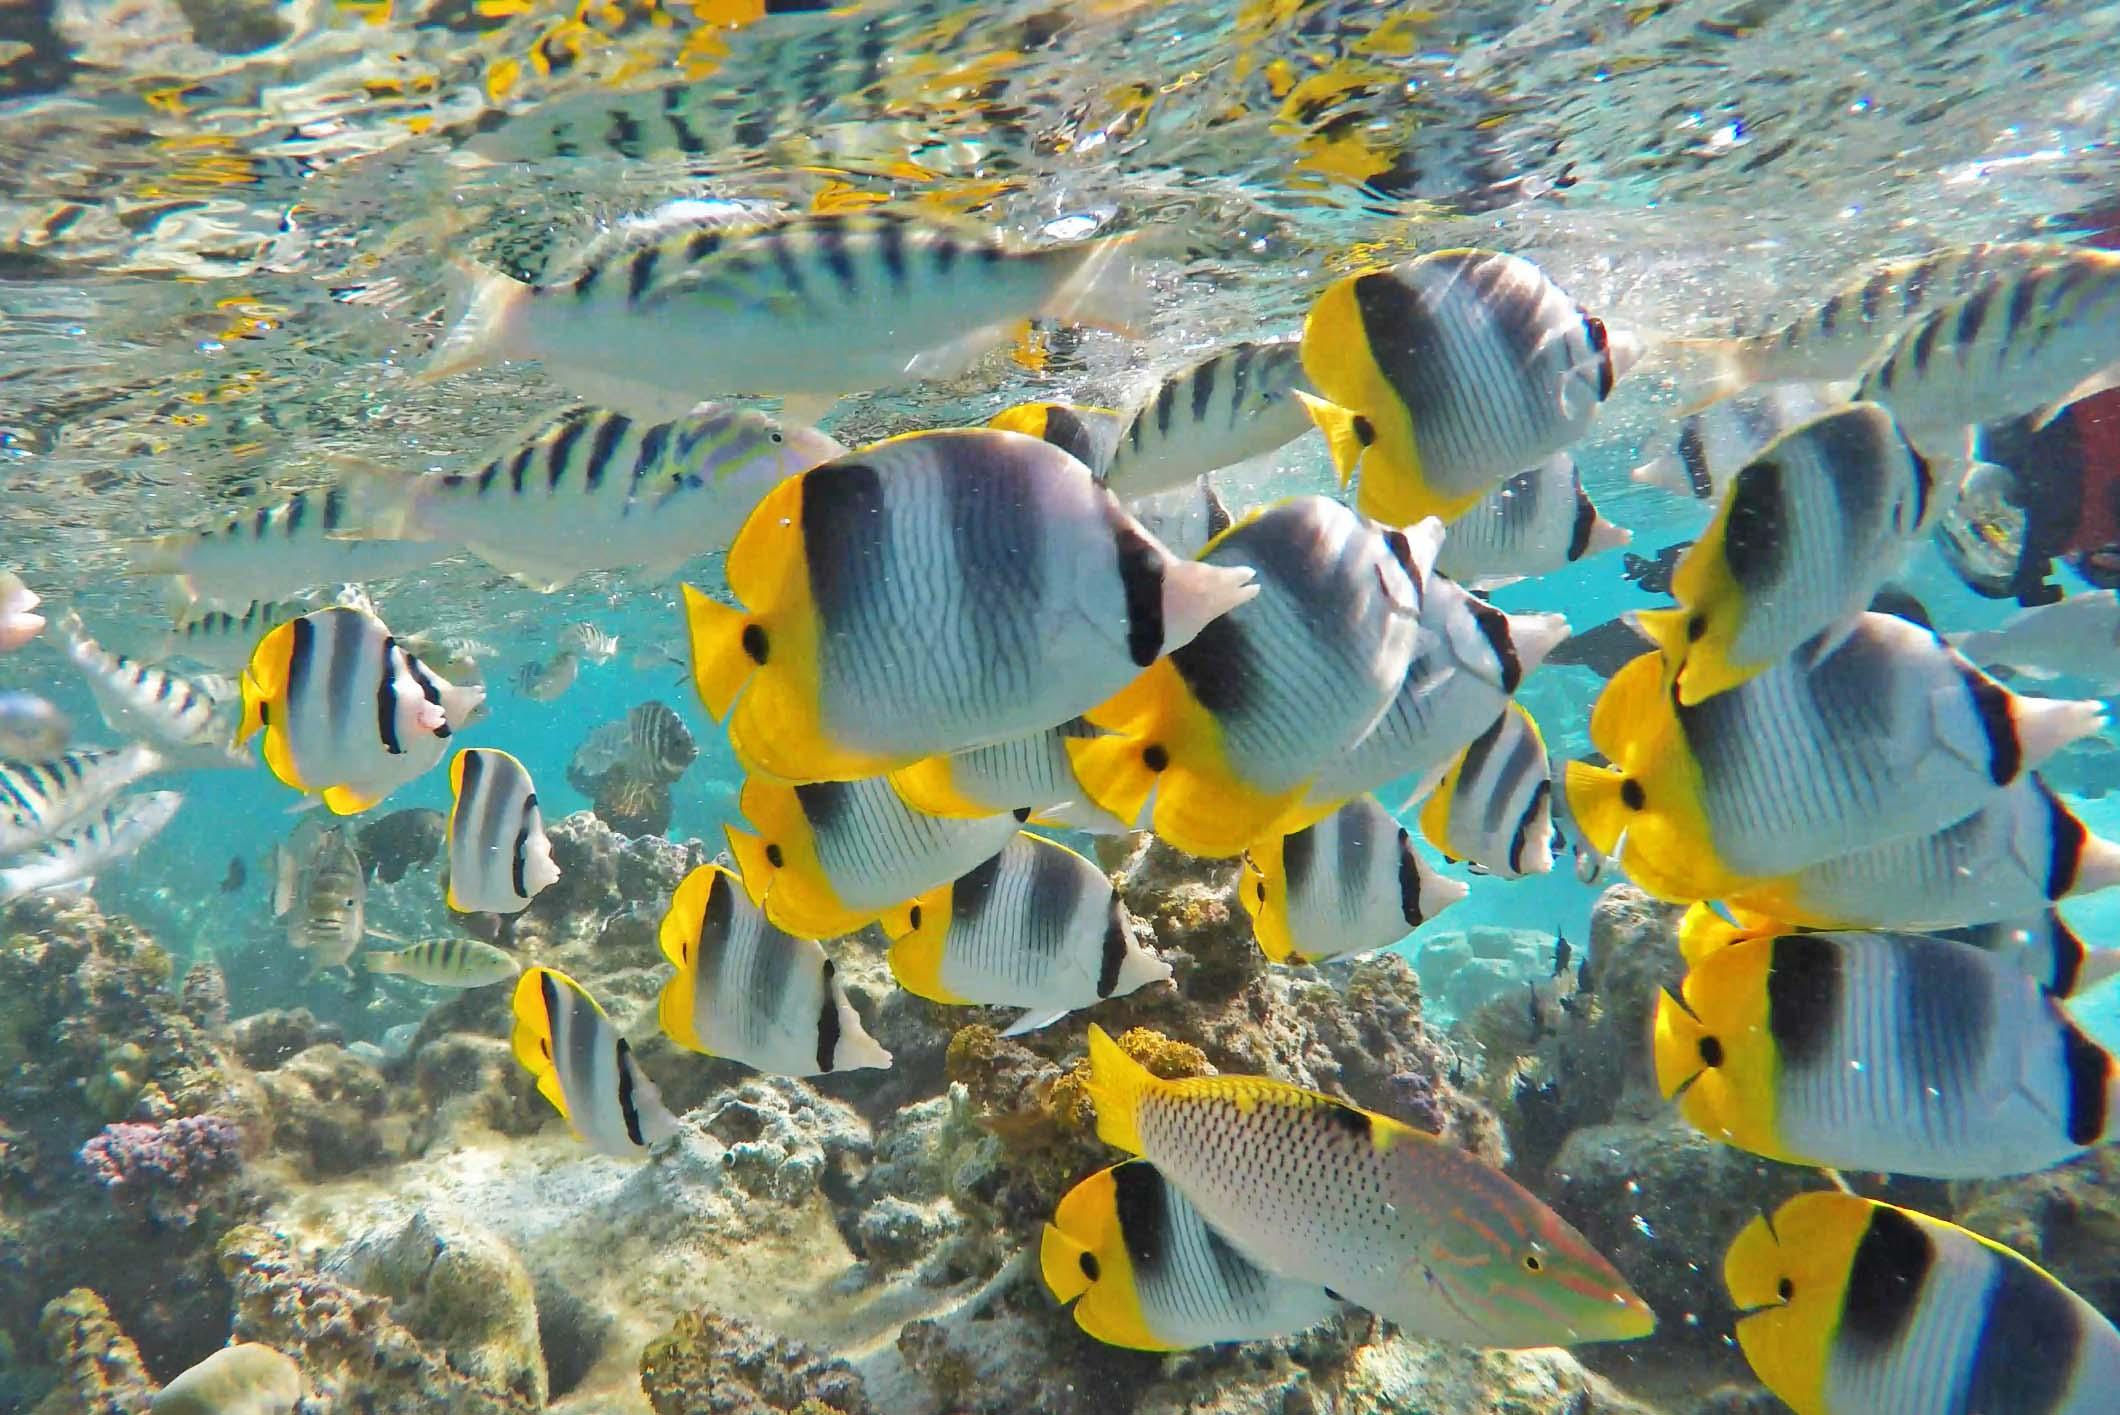 Vida marinha ao redor do Le Taha'a Island Resort | foto: Lala Rebelo